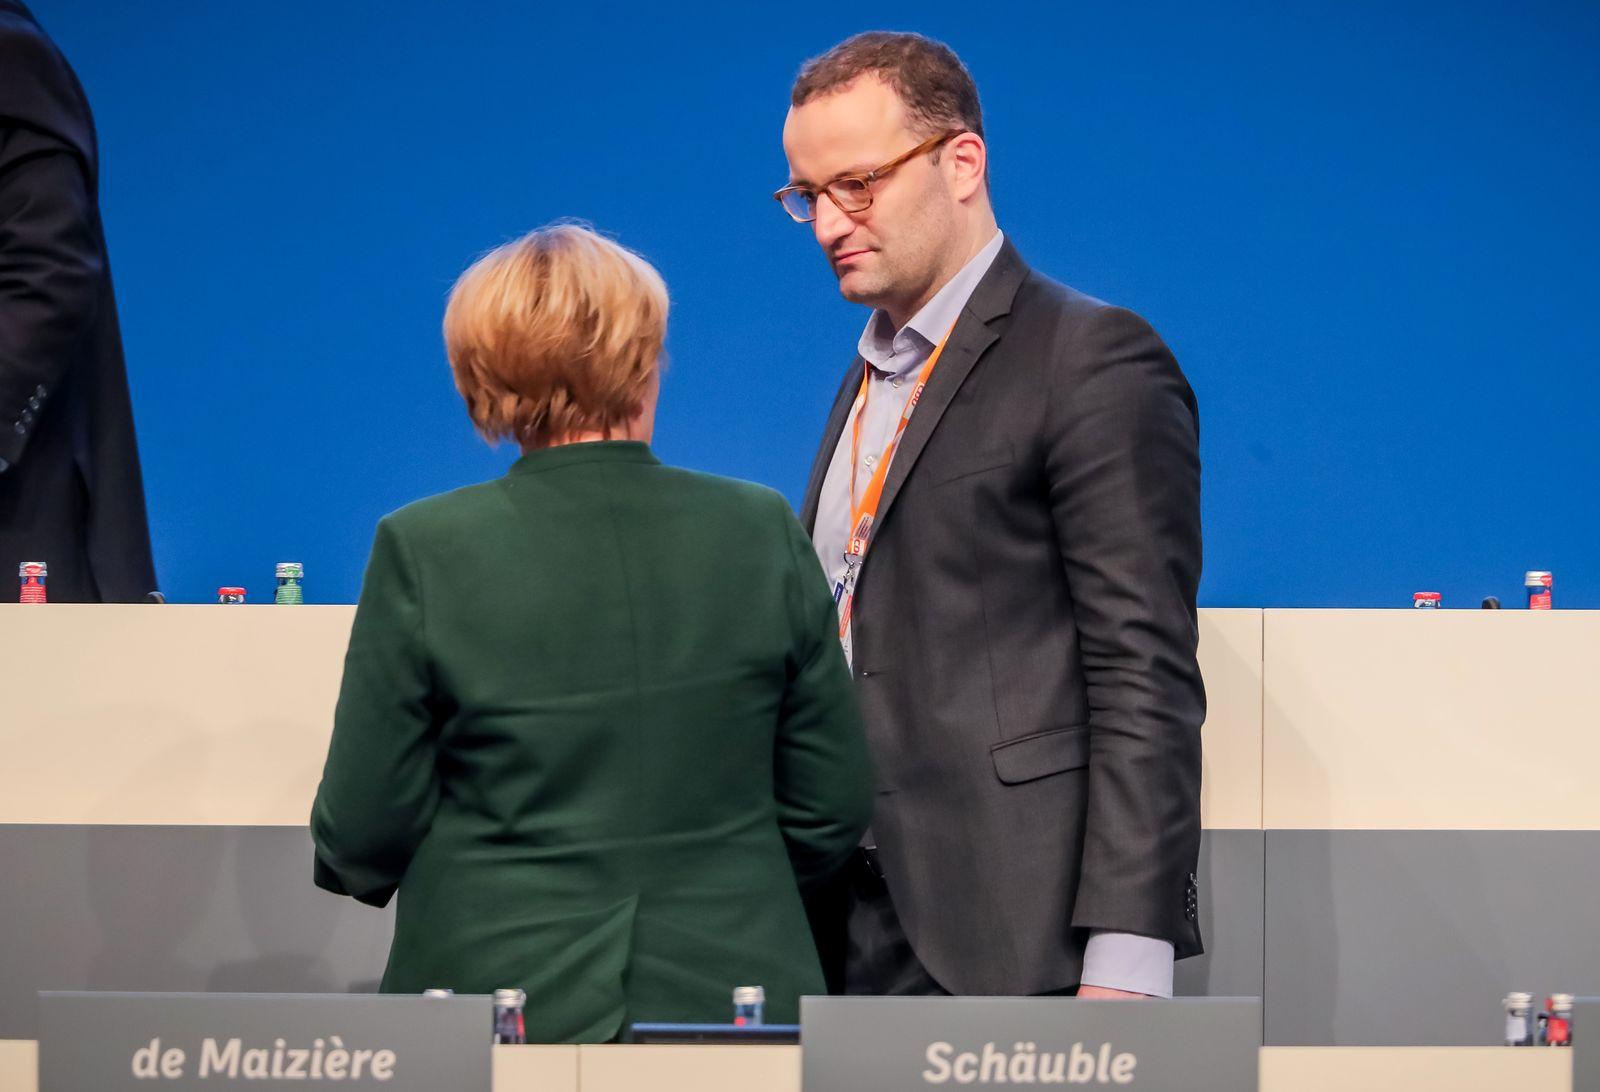 Jens Spahn / Angela Merkel